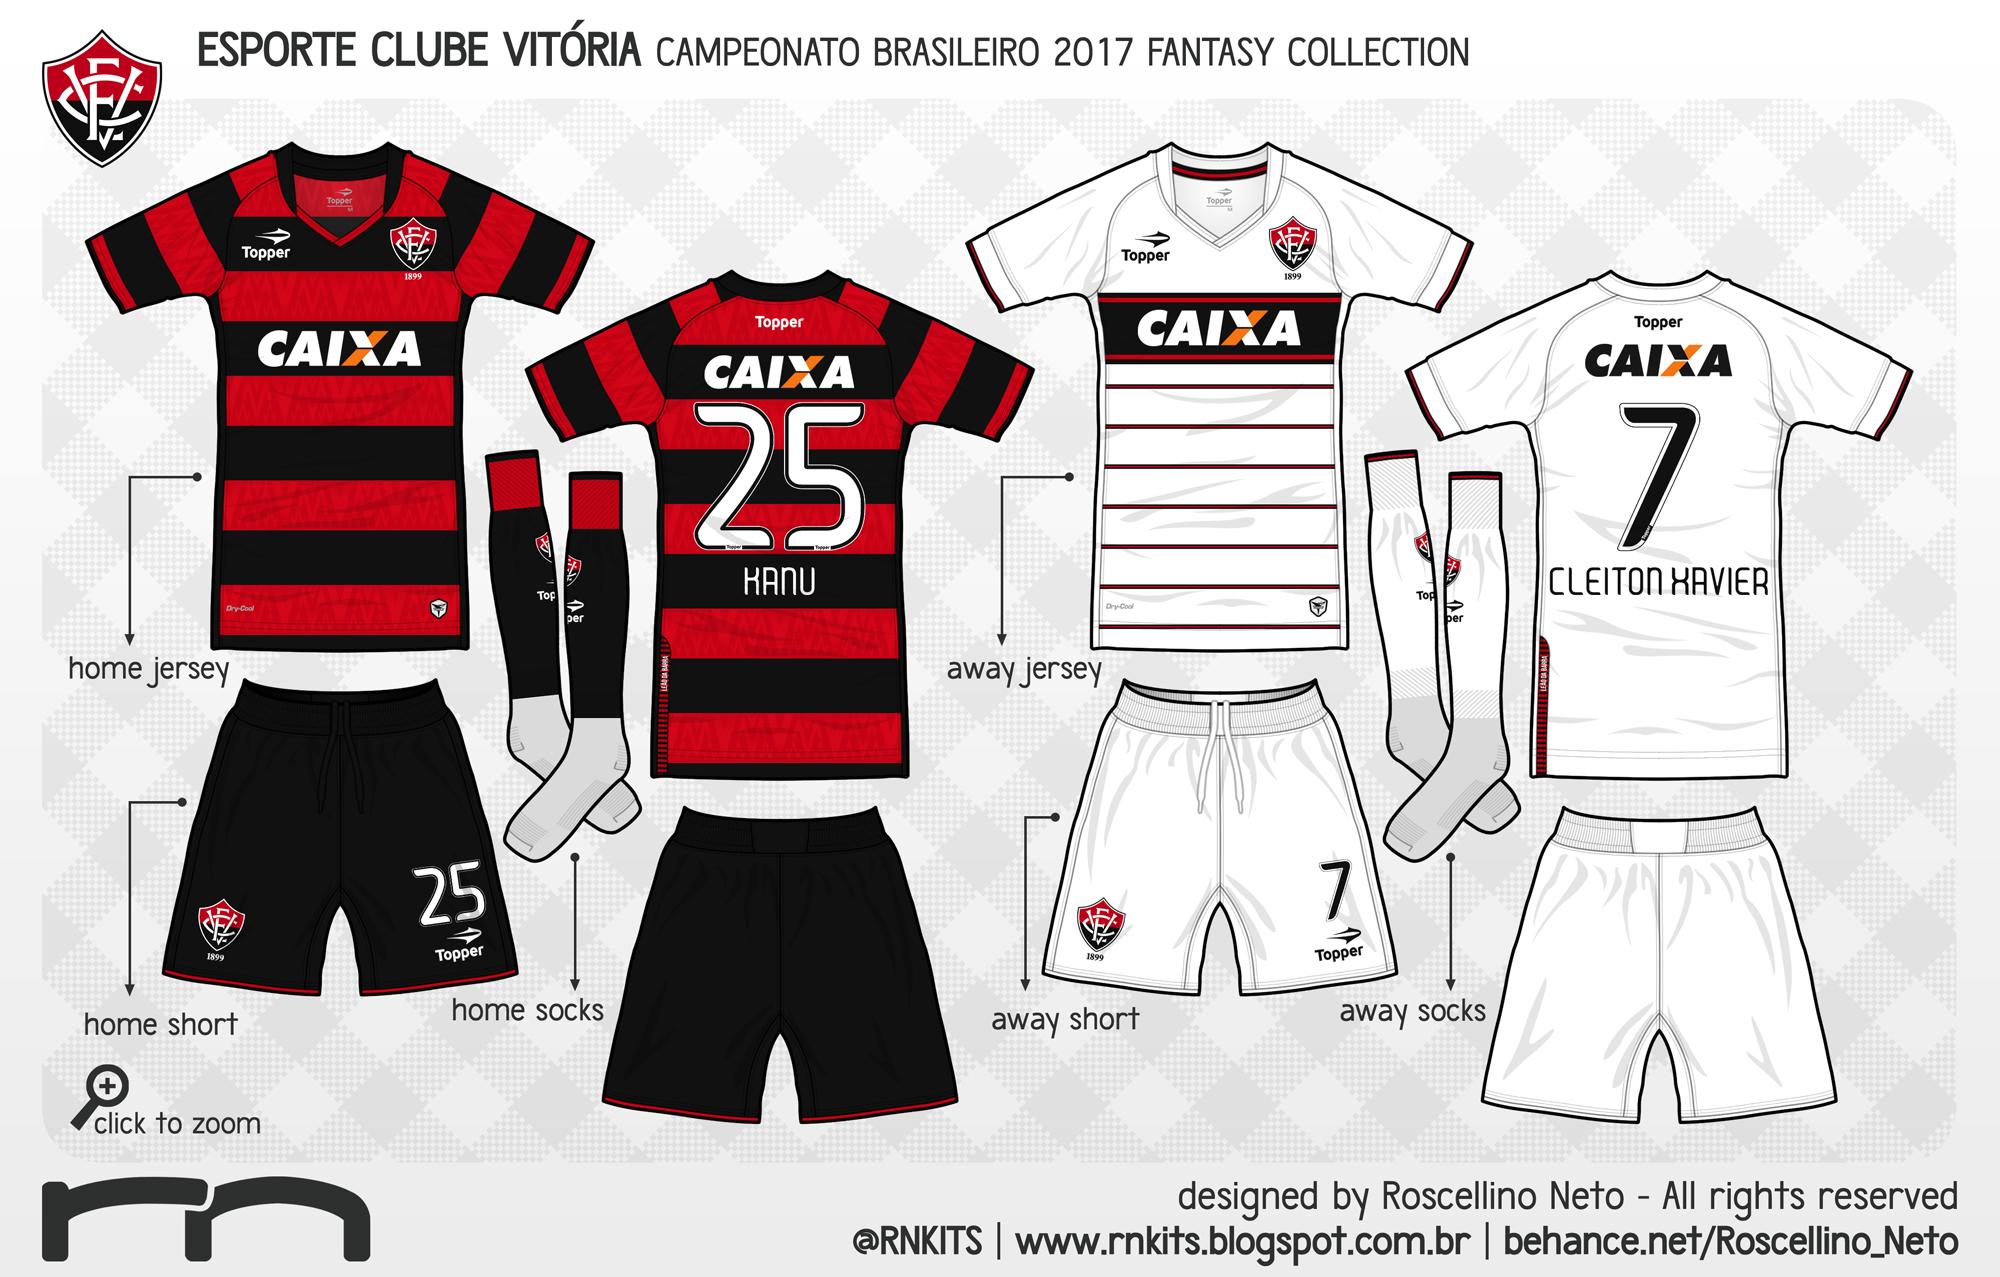 c71f0d9f51 RN Kits  Projeto Campeonato Brasileiro 2017